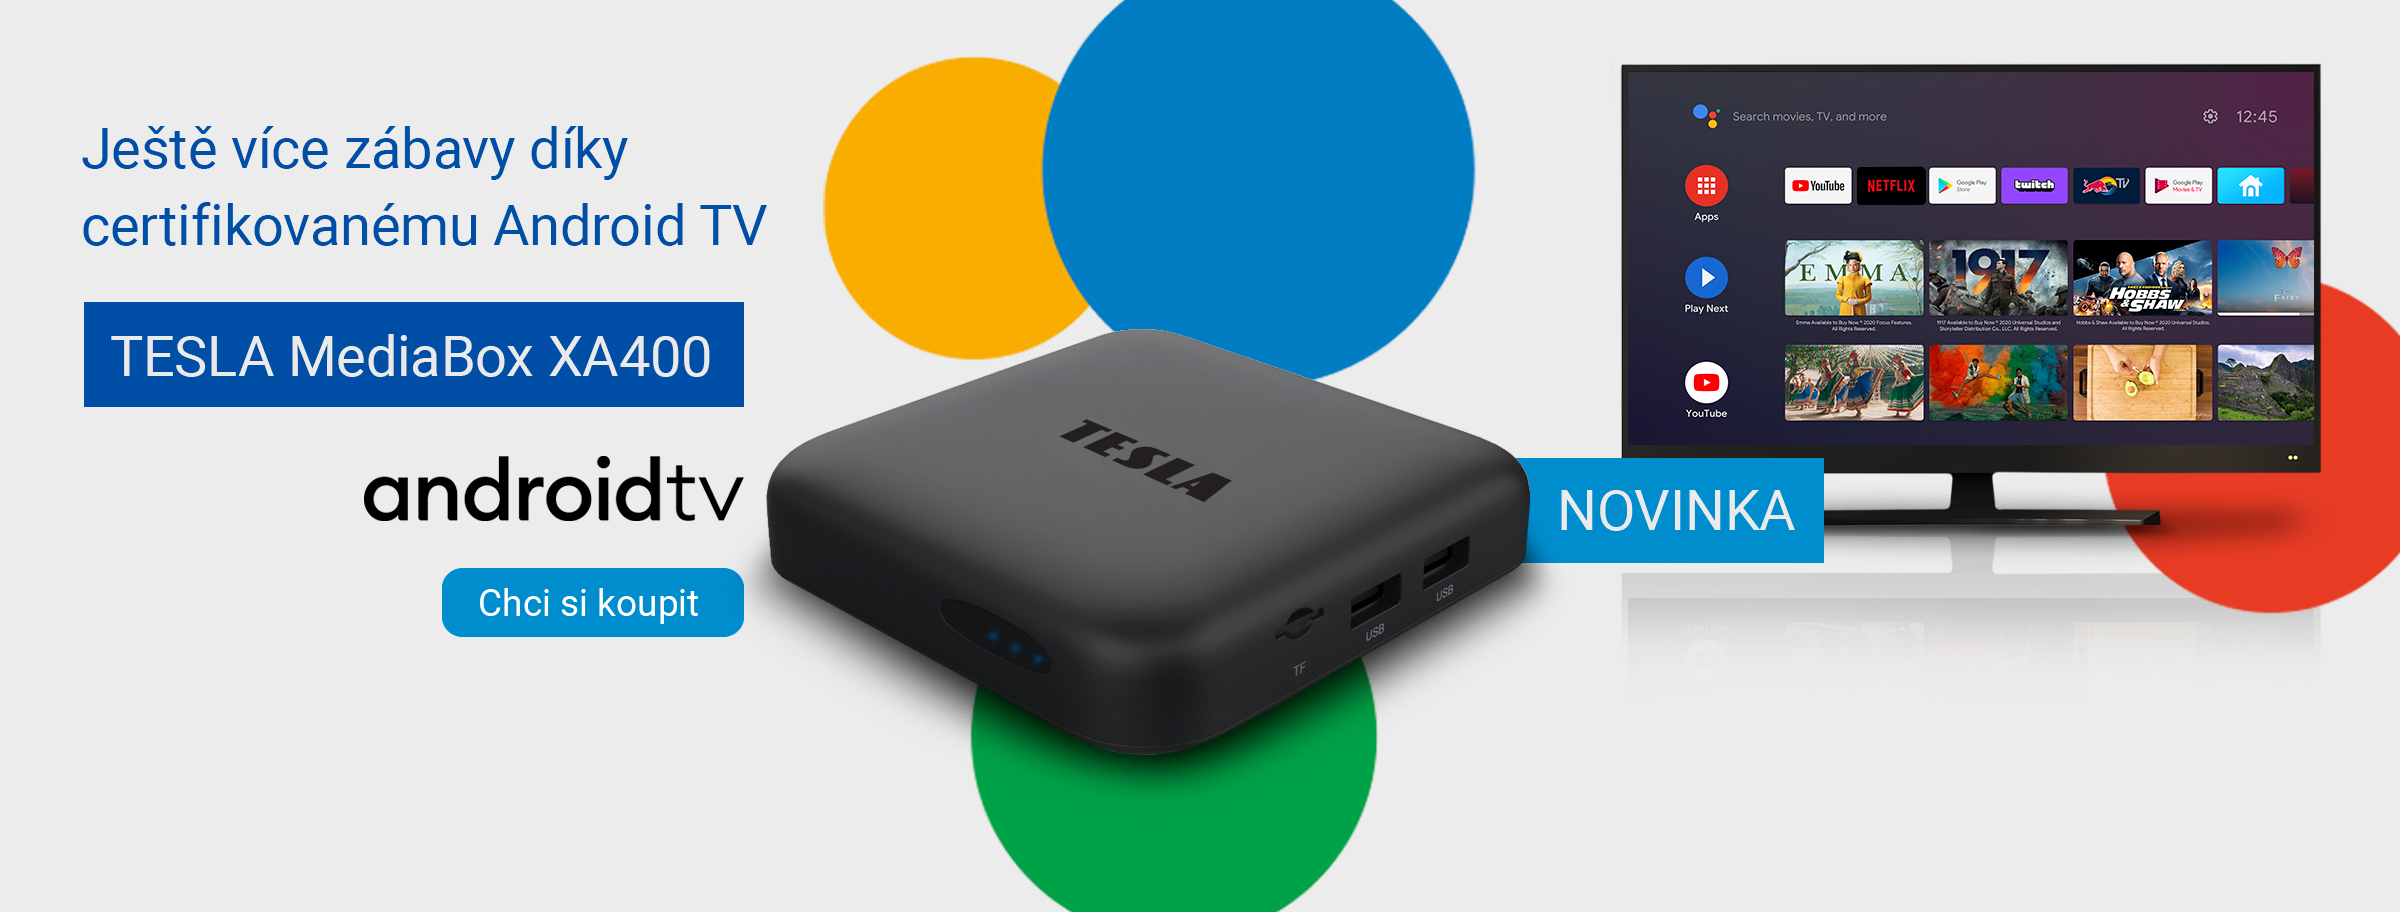 Novinka: TESLA MediaBox XA400 Android TV – UHD multimediální přehrávač